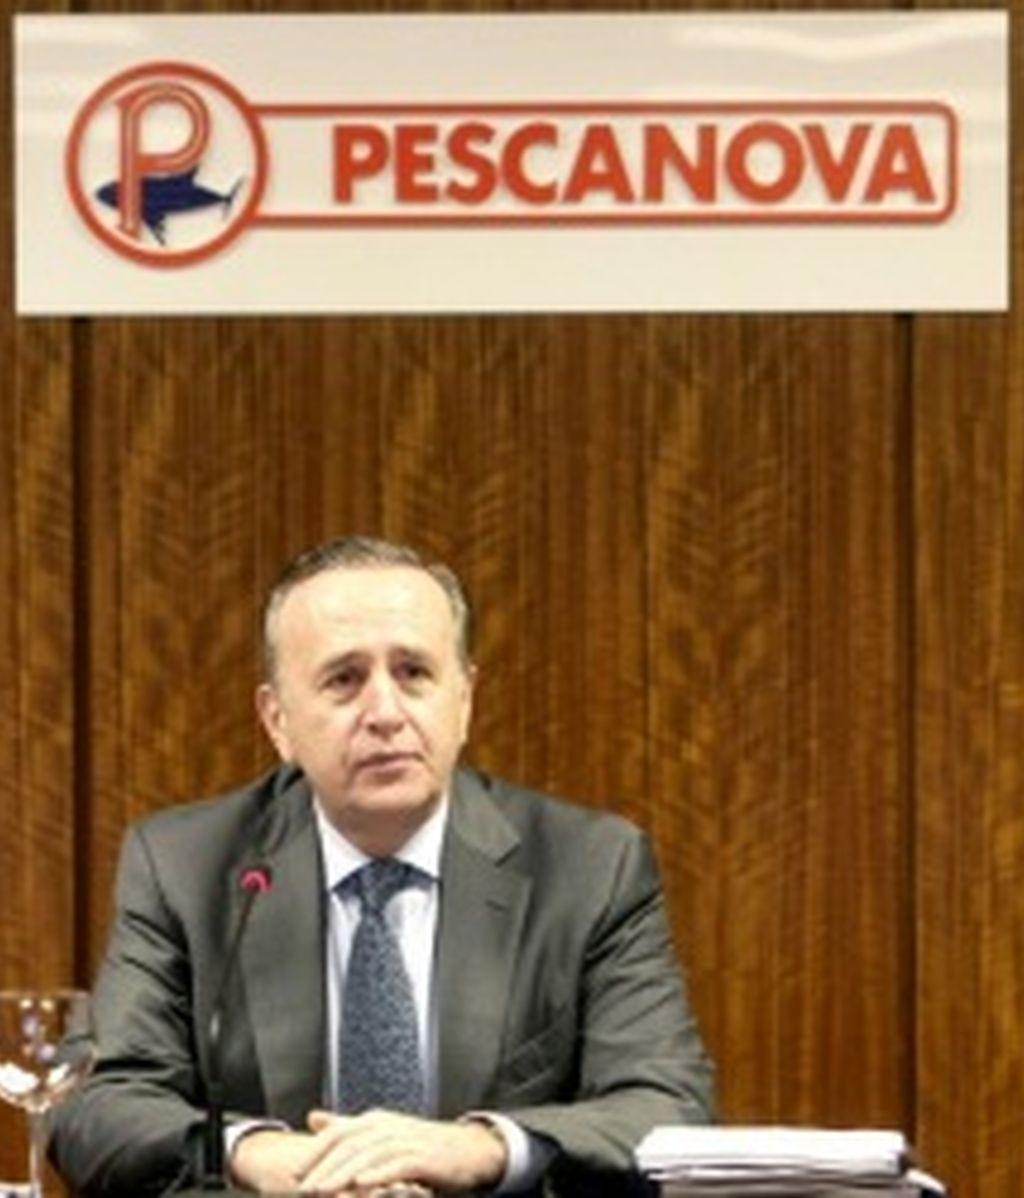 El presidente de Pescanova, Manuel Fernández de Sousa-Faro.